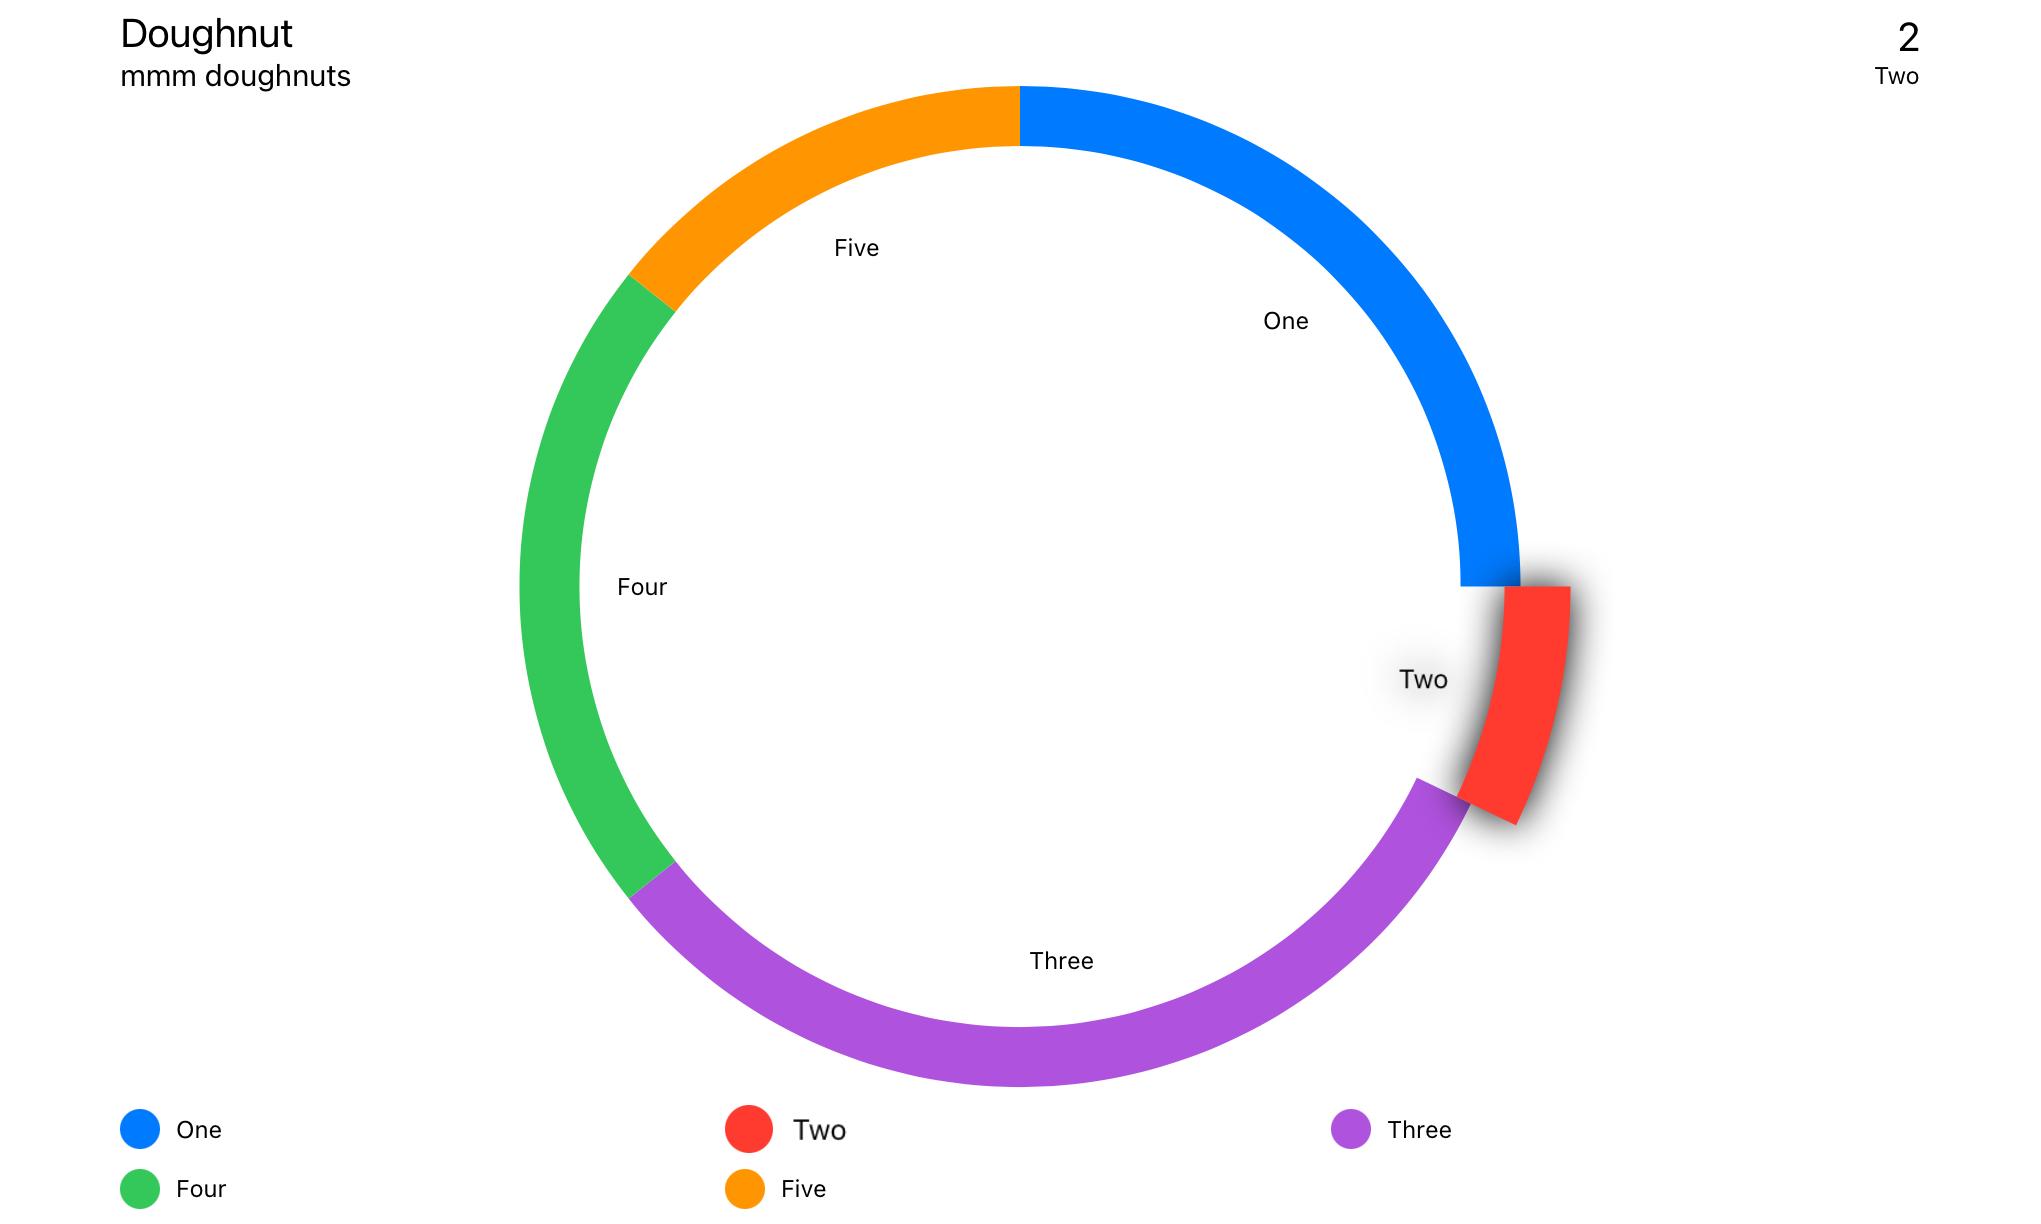 Example of Doughnut Chart